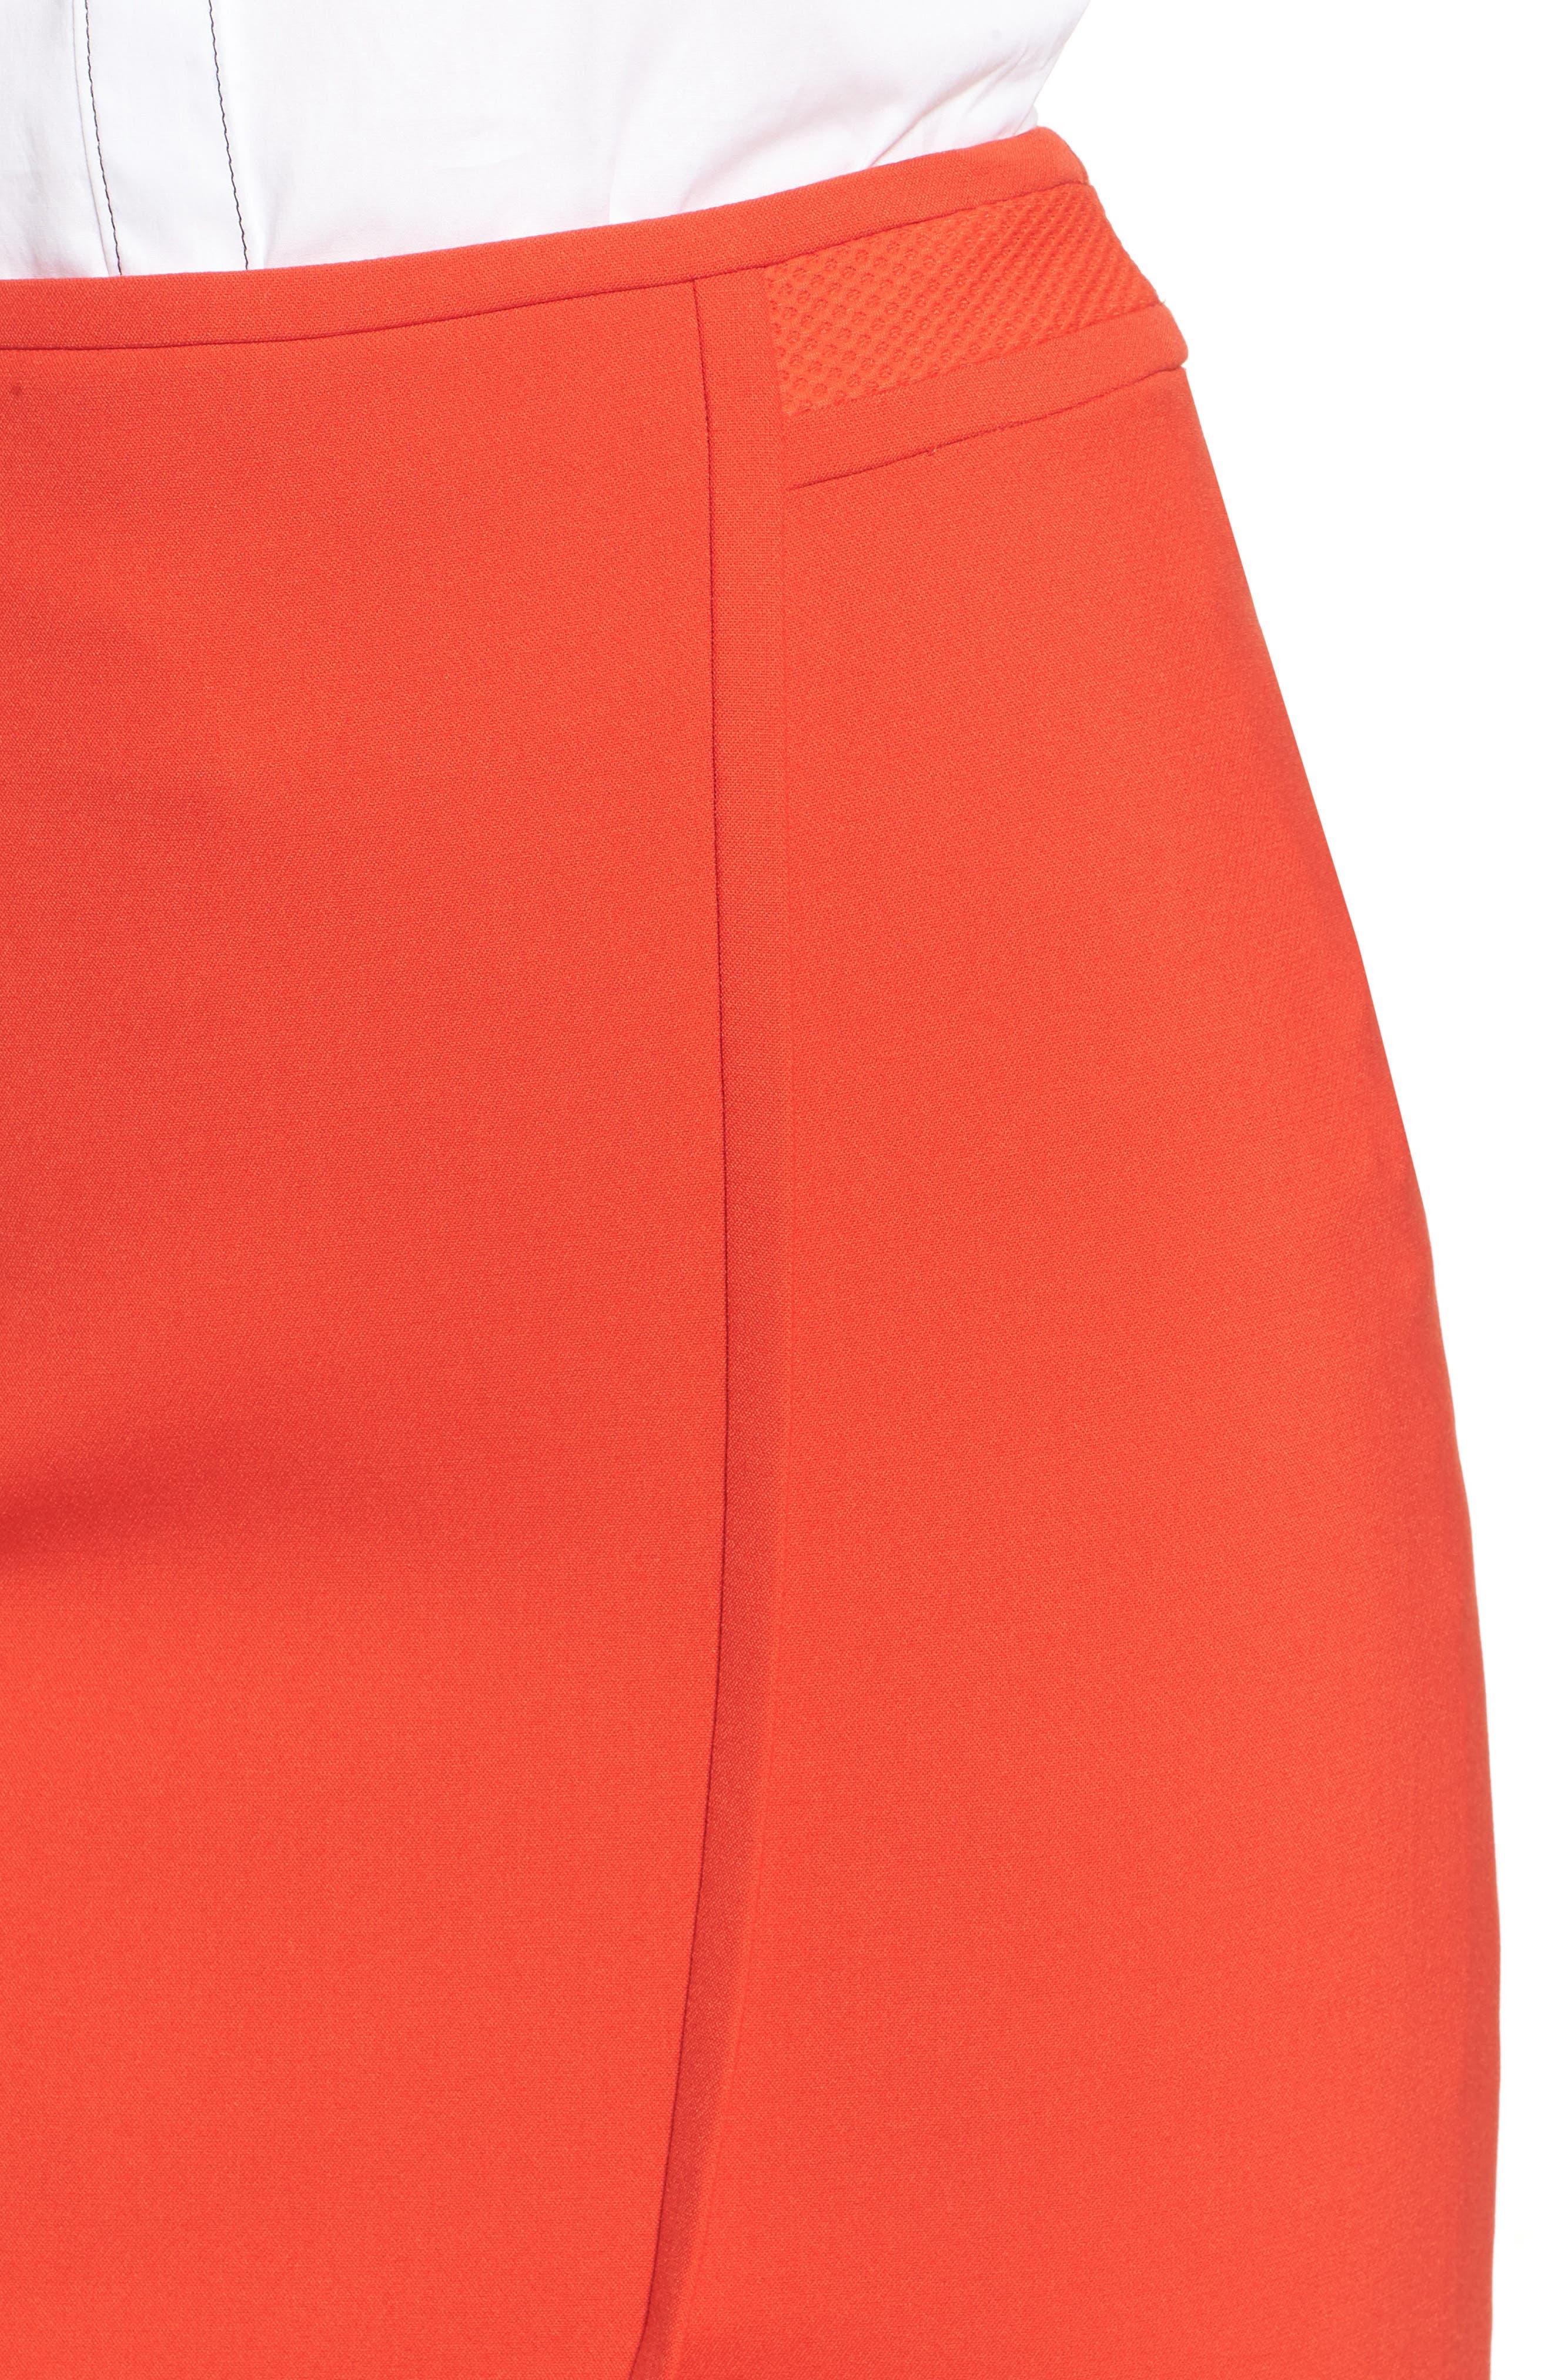 Vadama Ponte Pencil Skirt,                             Alternate thumbnail 4, color,